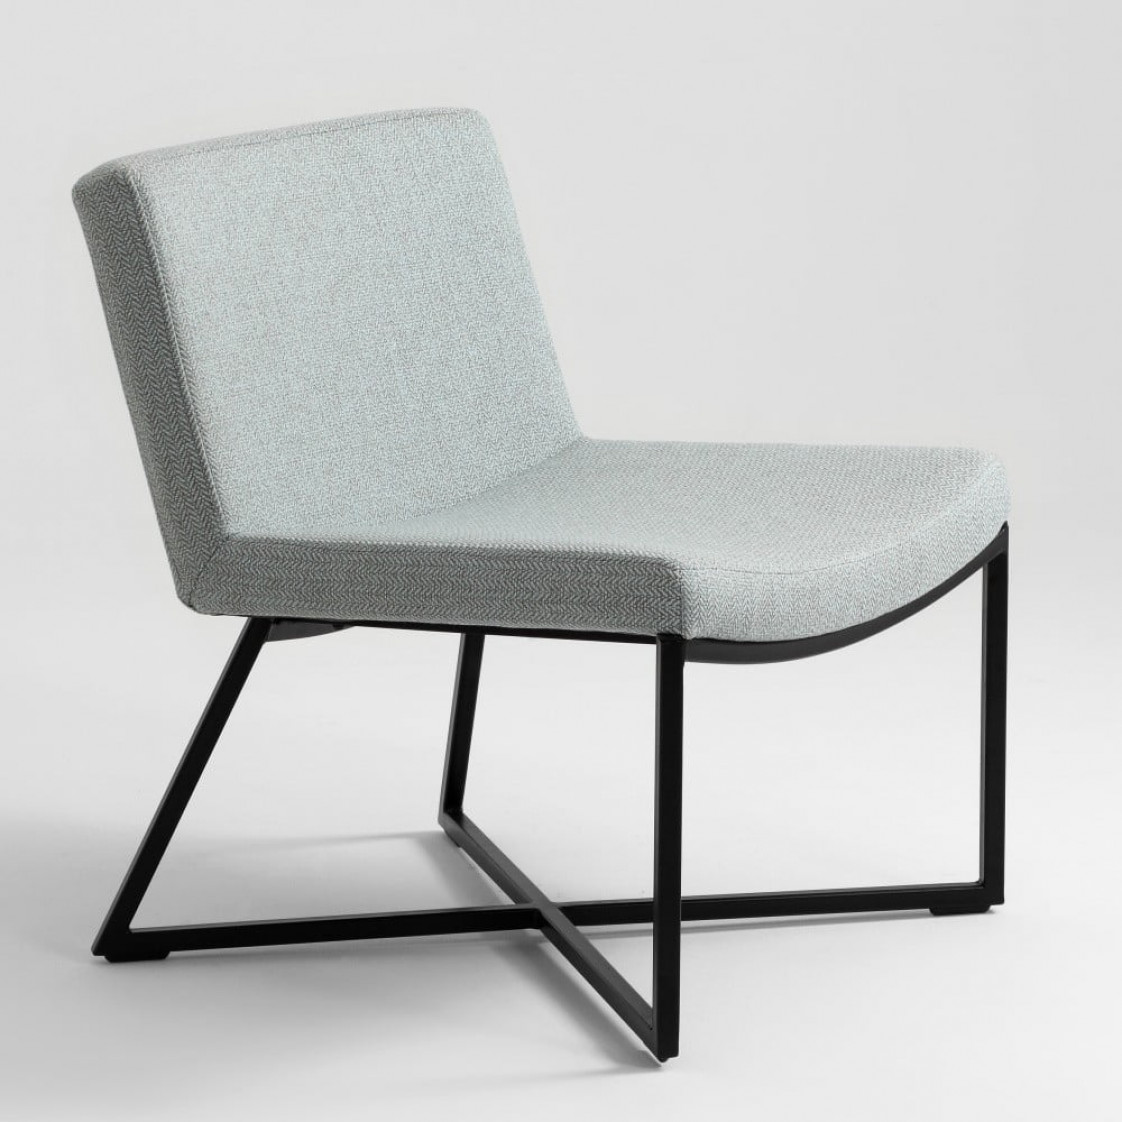 Armchair Zero | Light Blue & Black Legs